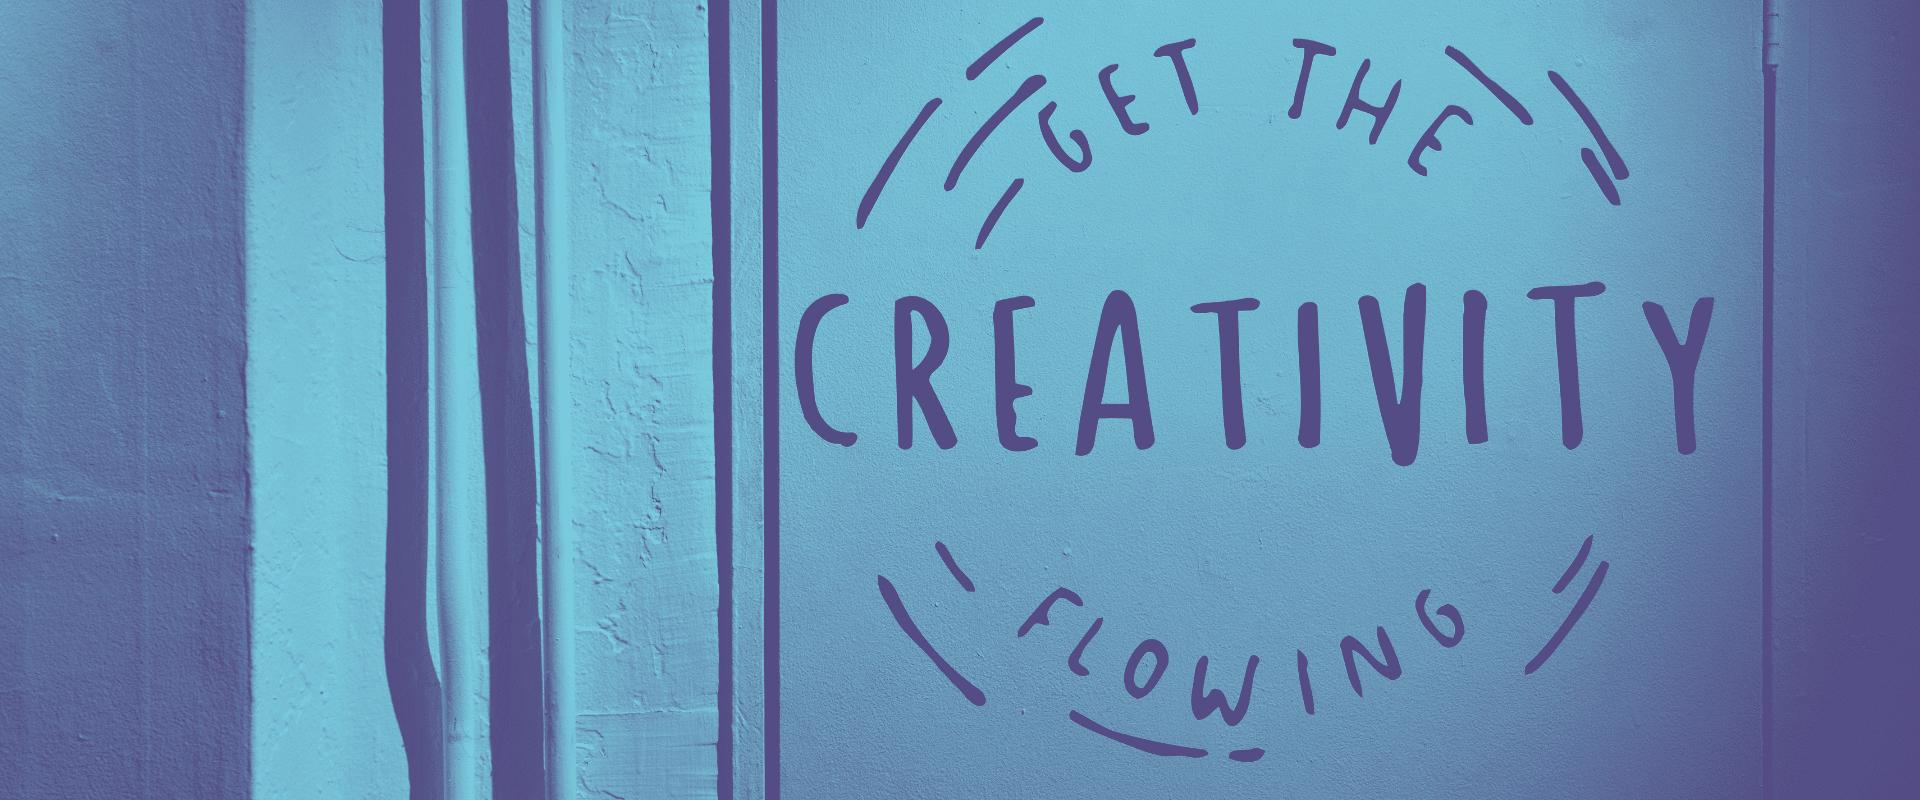 Marketing creatiu